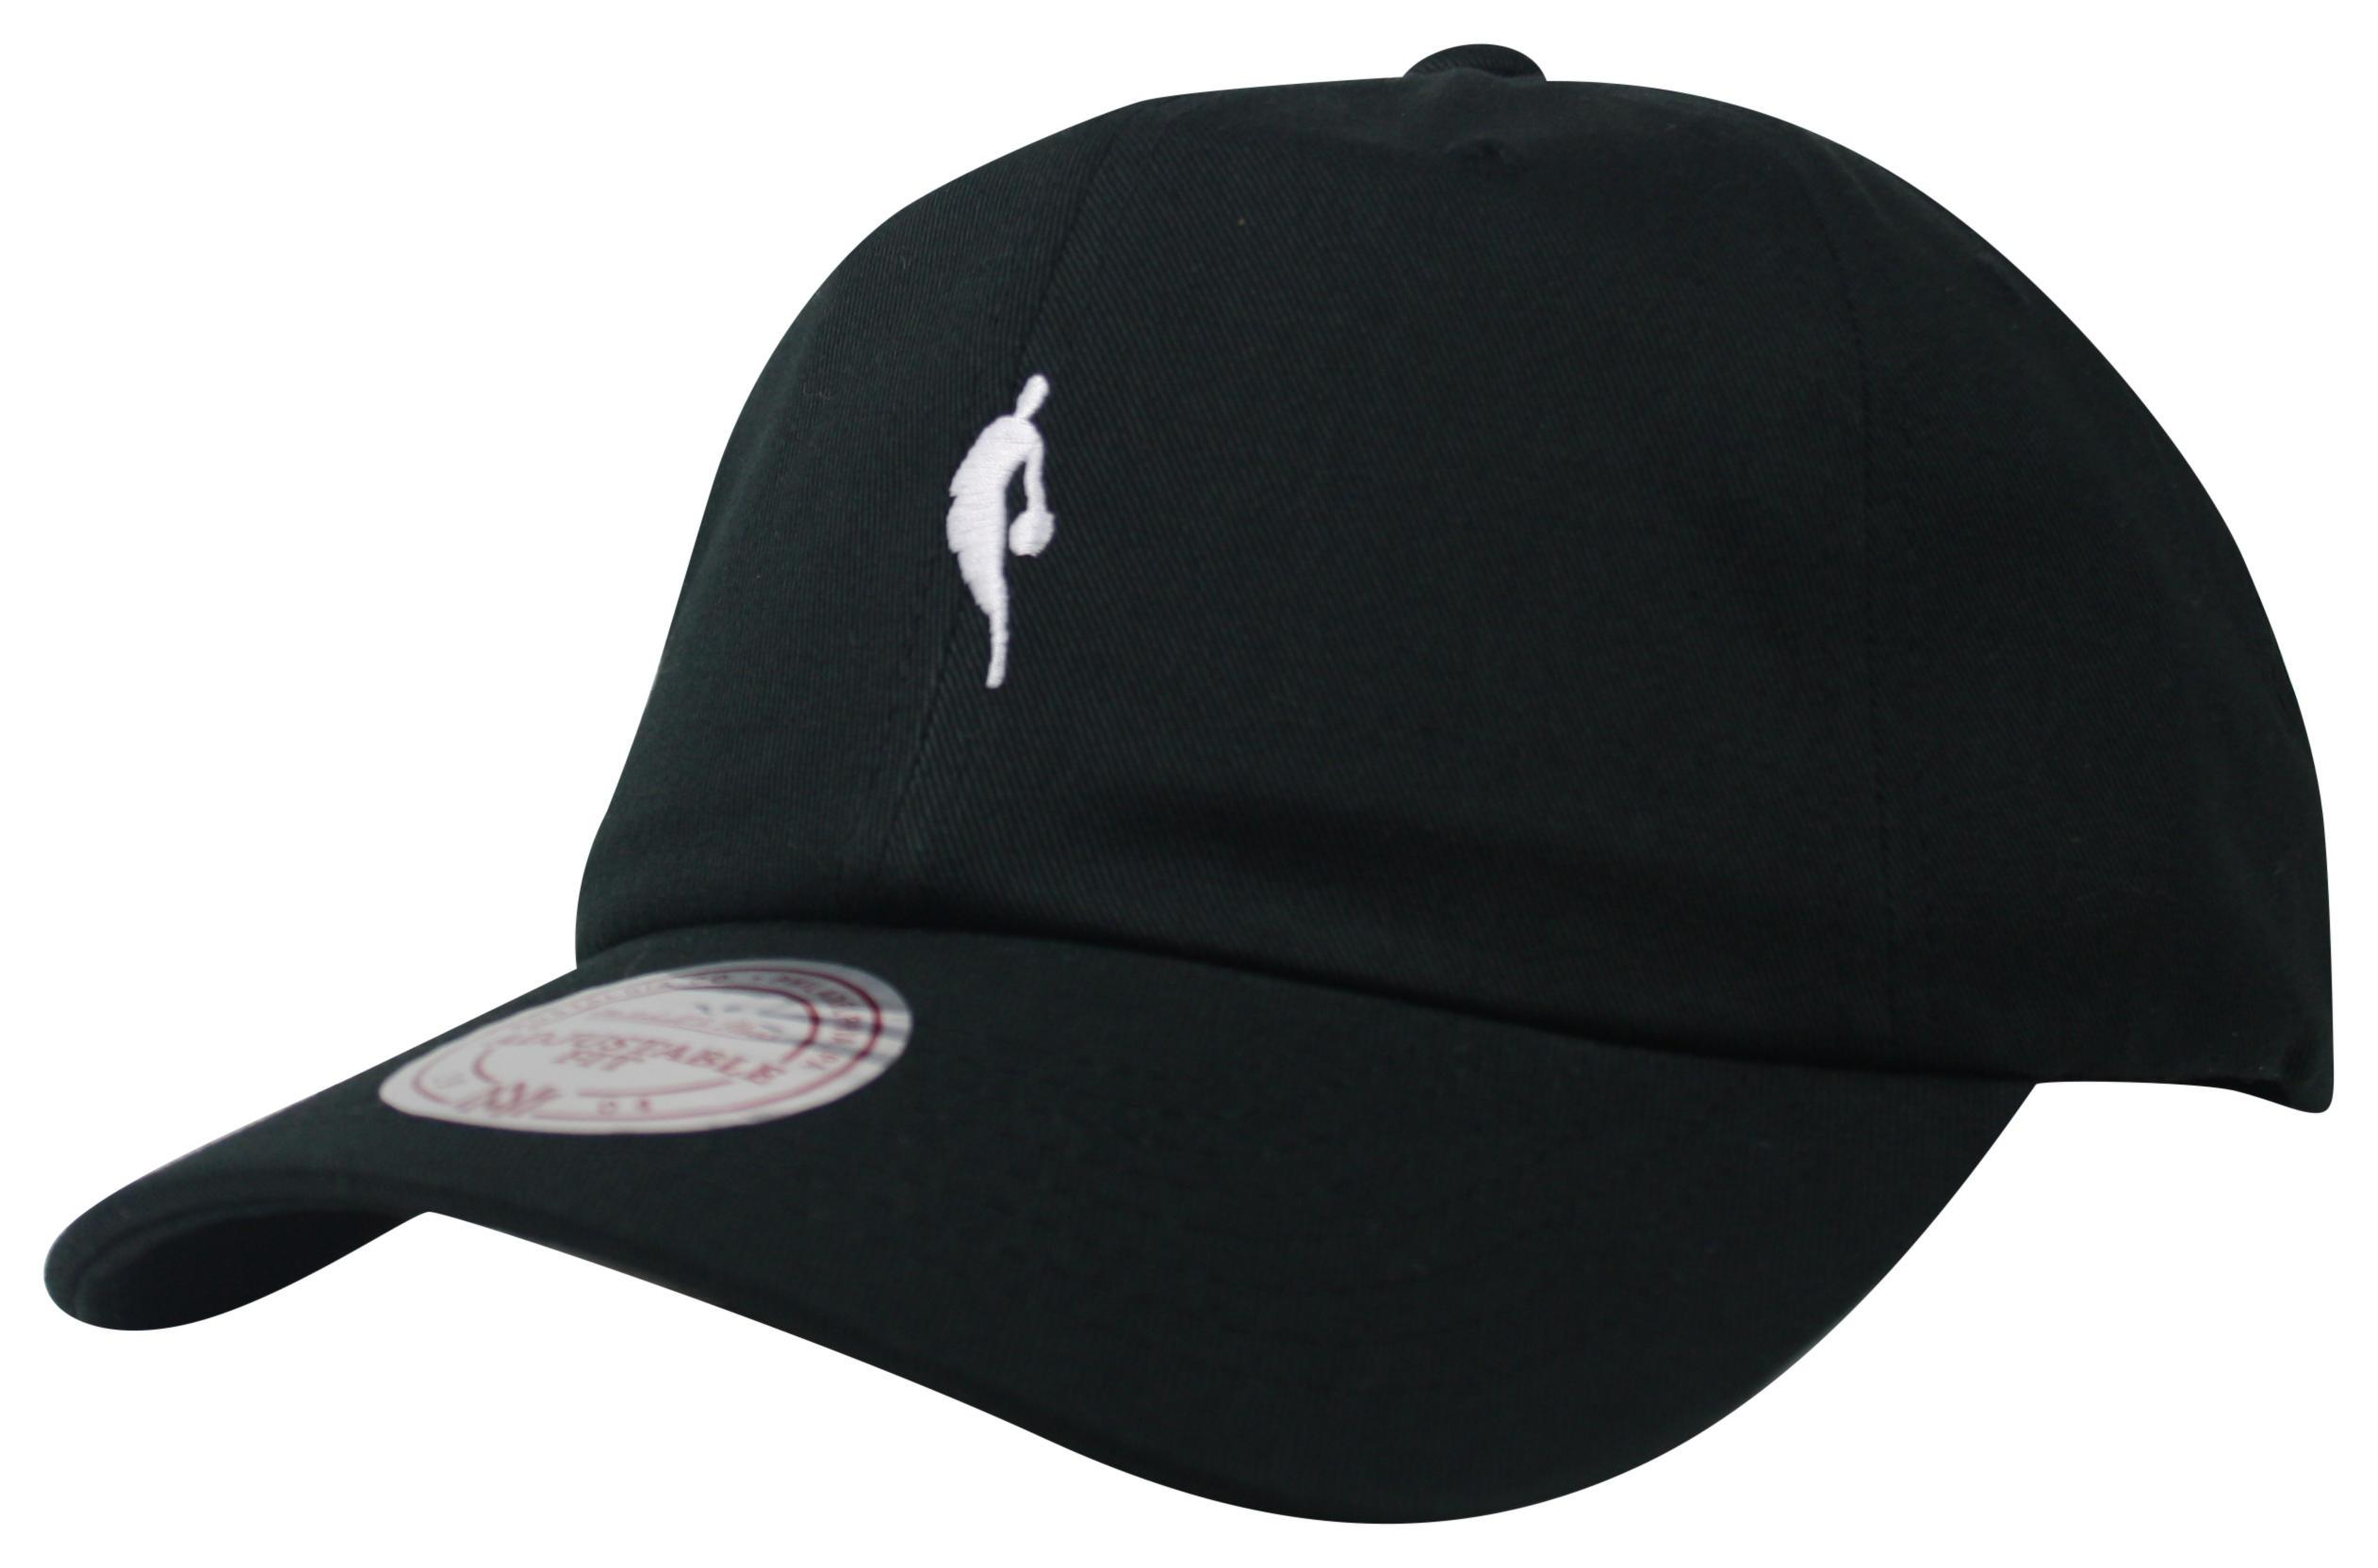 71a5ec51 Mitchell & Ness | NBA Logoman Black Little Dribbler Dad Hat Snapback